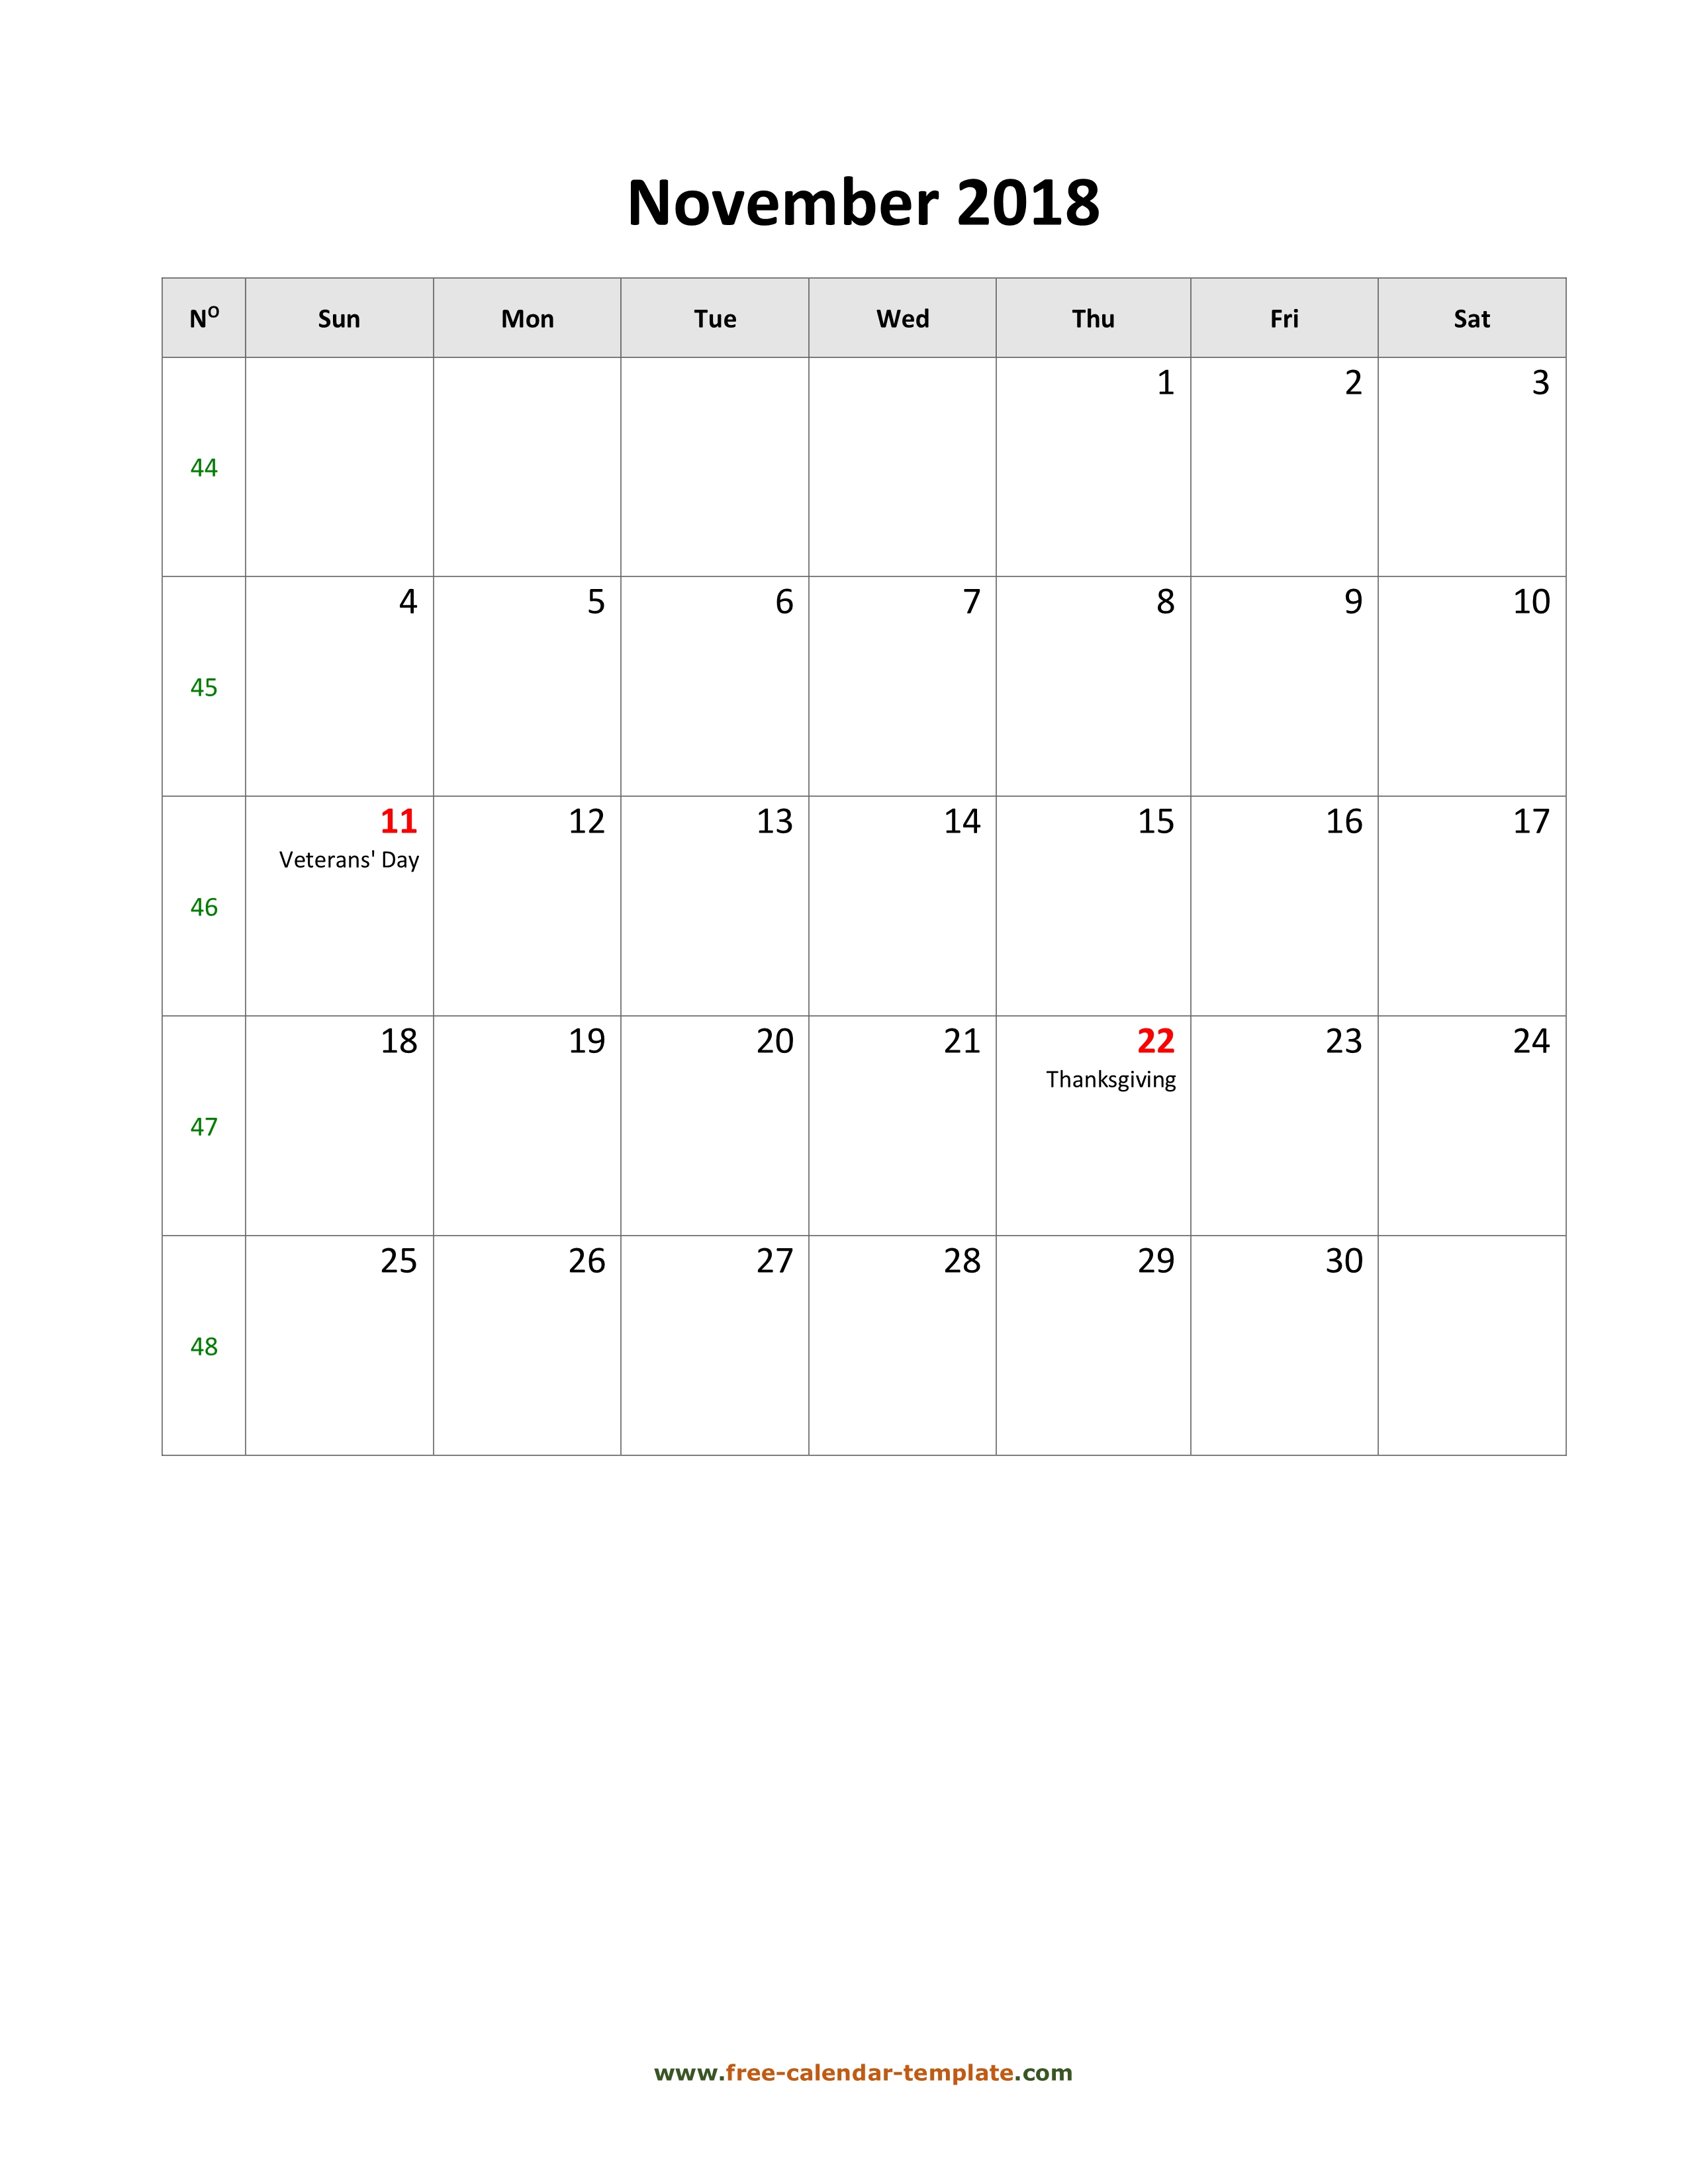 2018 November Calendar (Blank Vertical Template) | Free-Calendar for Holidays Calendar Templates November